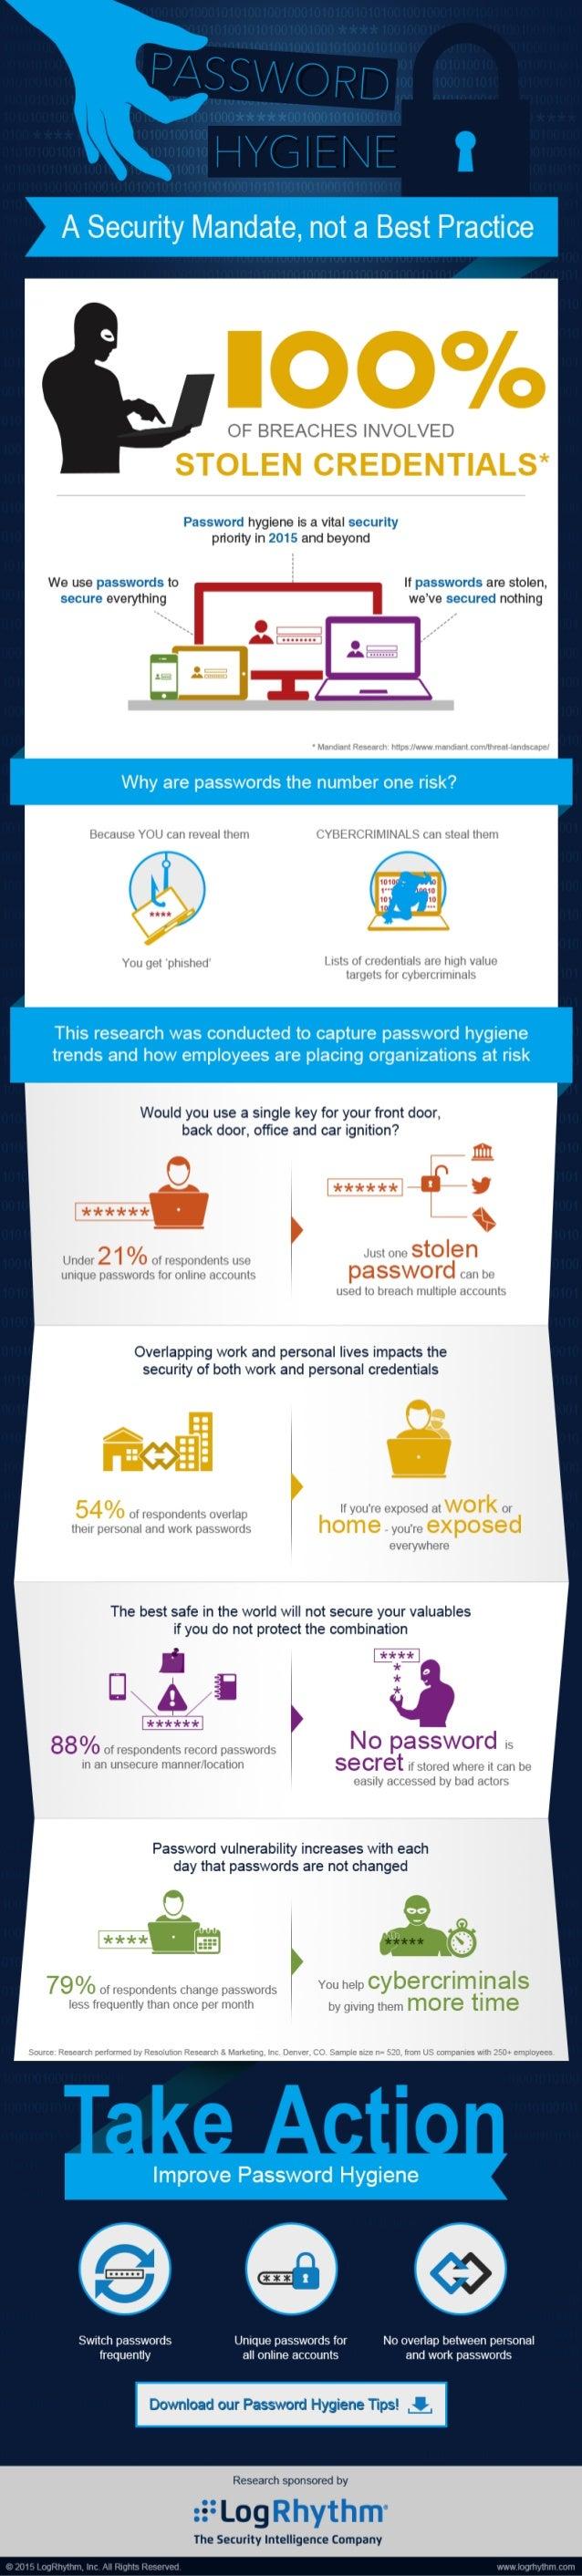 LogRhythm Password Hygiene Infographic